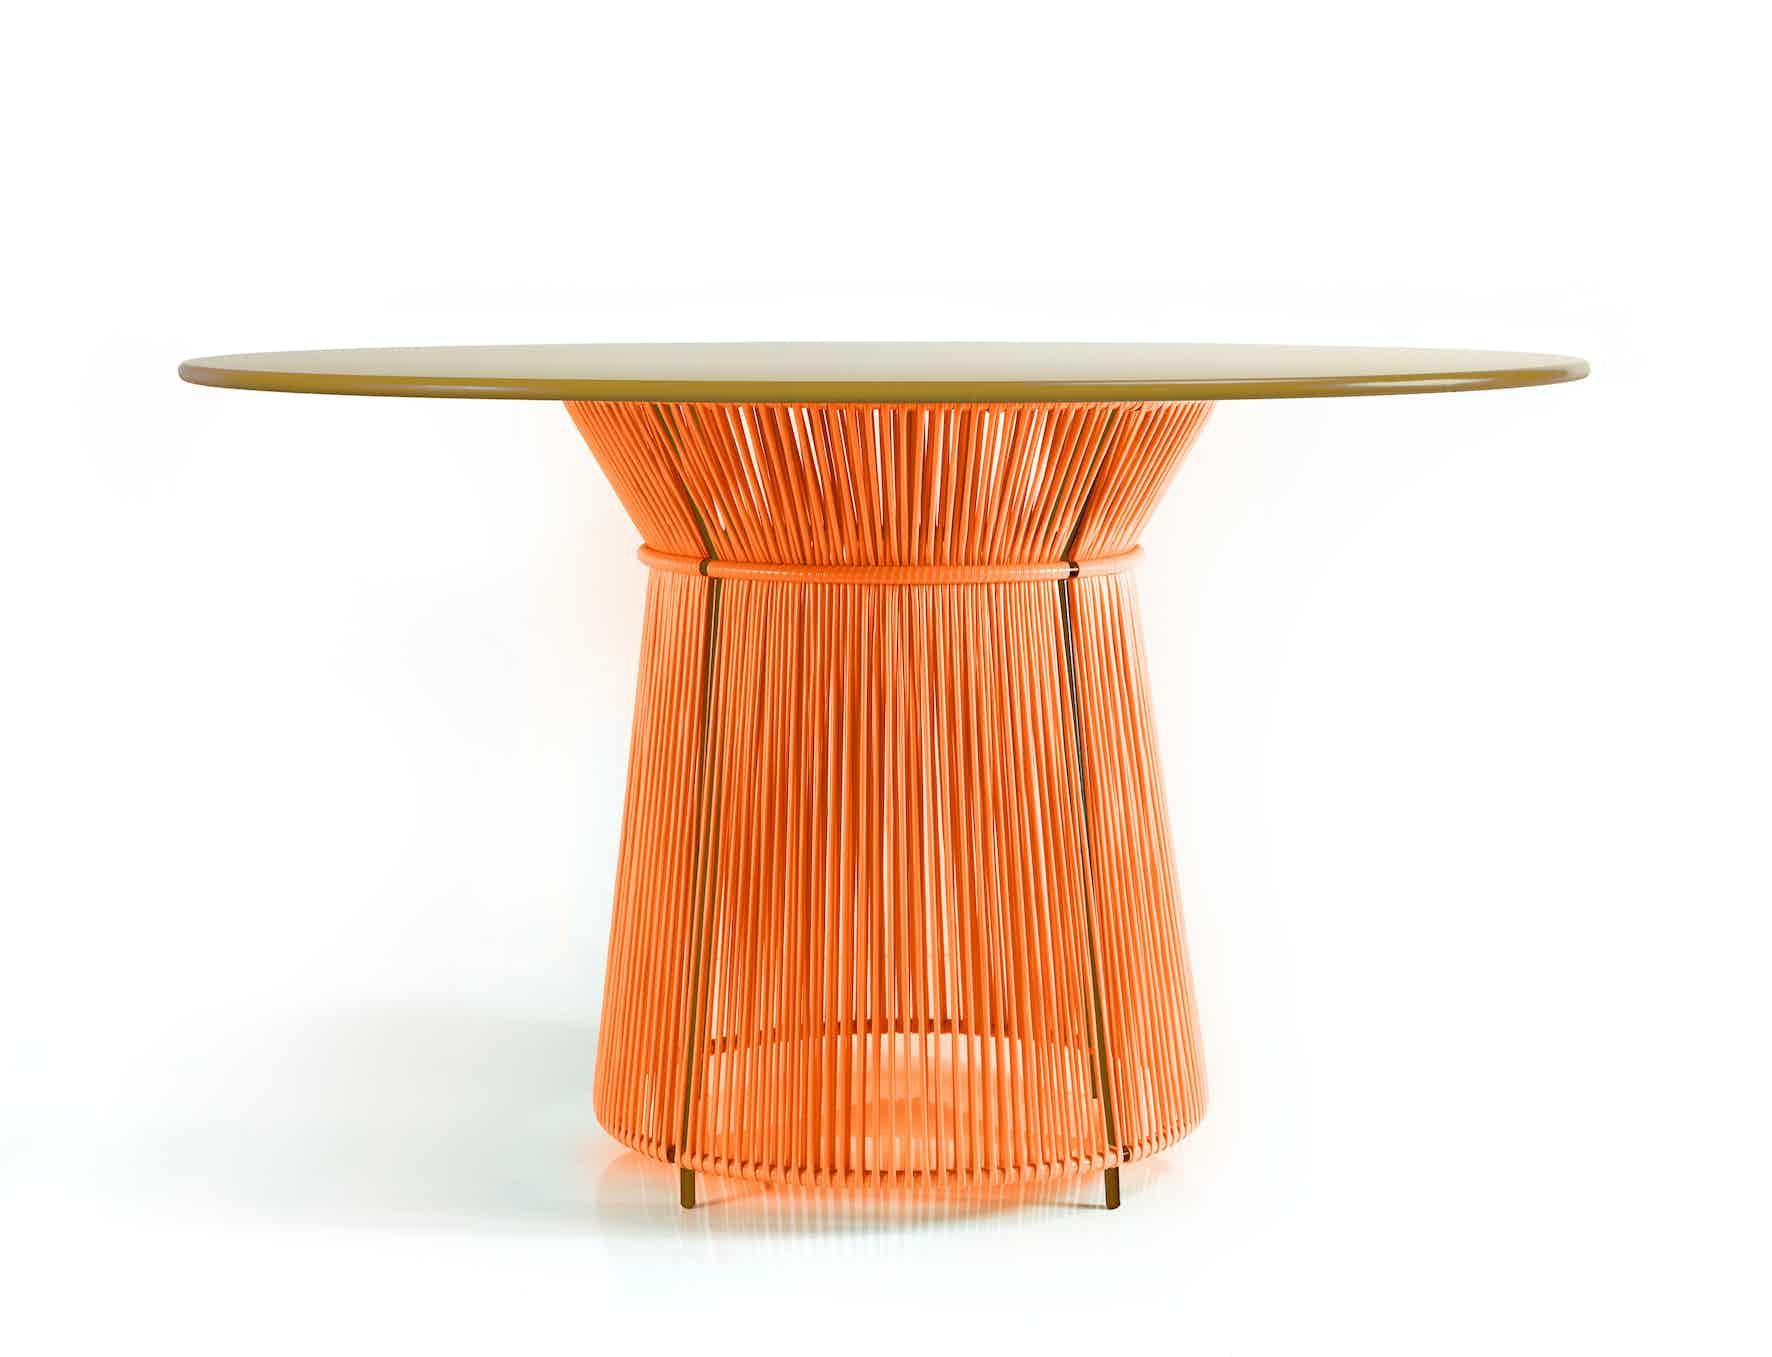 Ames furniture design caribe dining table orange haute living